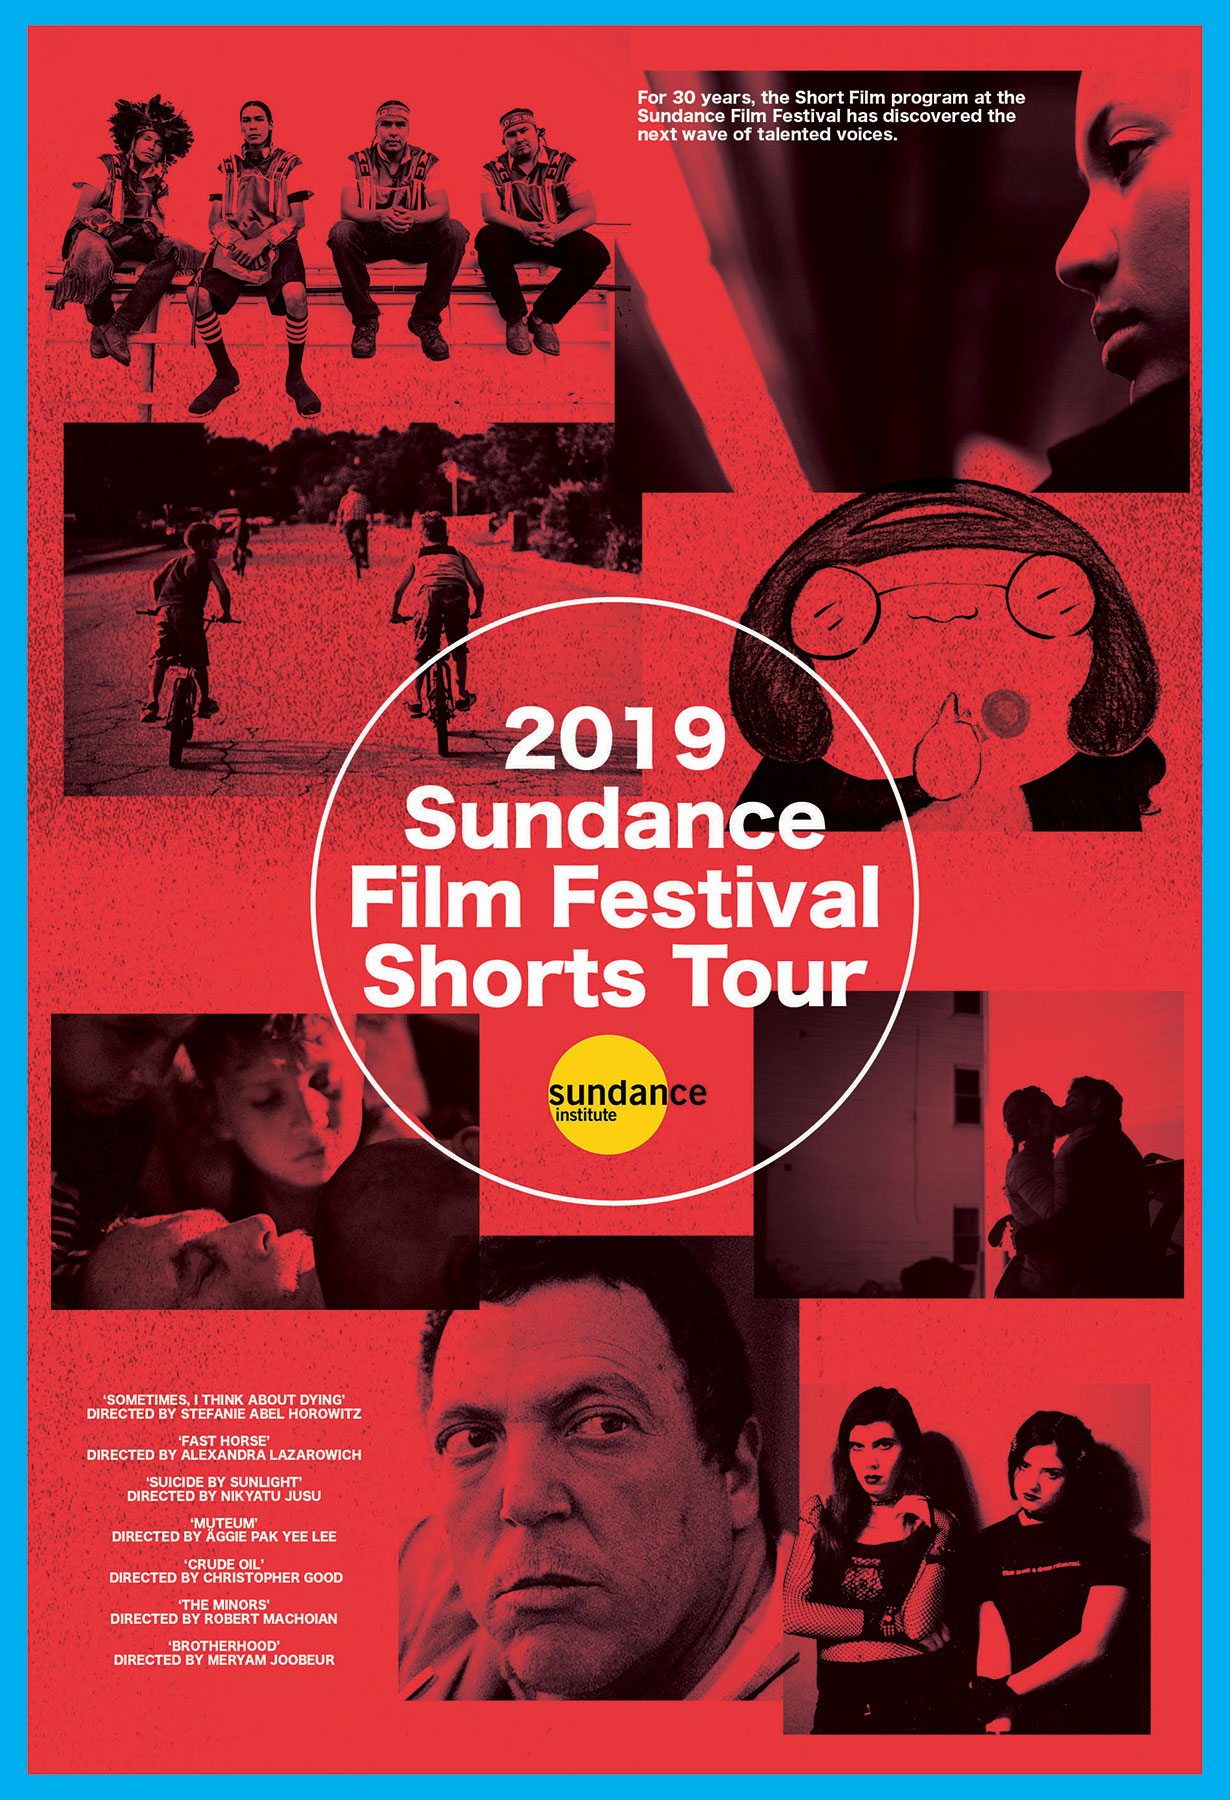 Poster for Sundance Shorts Tour